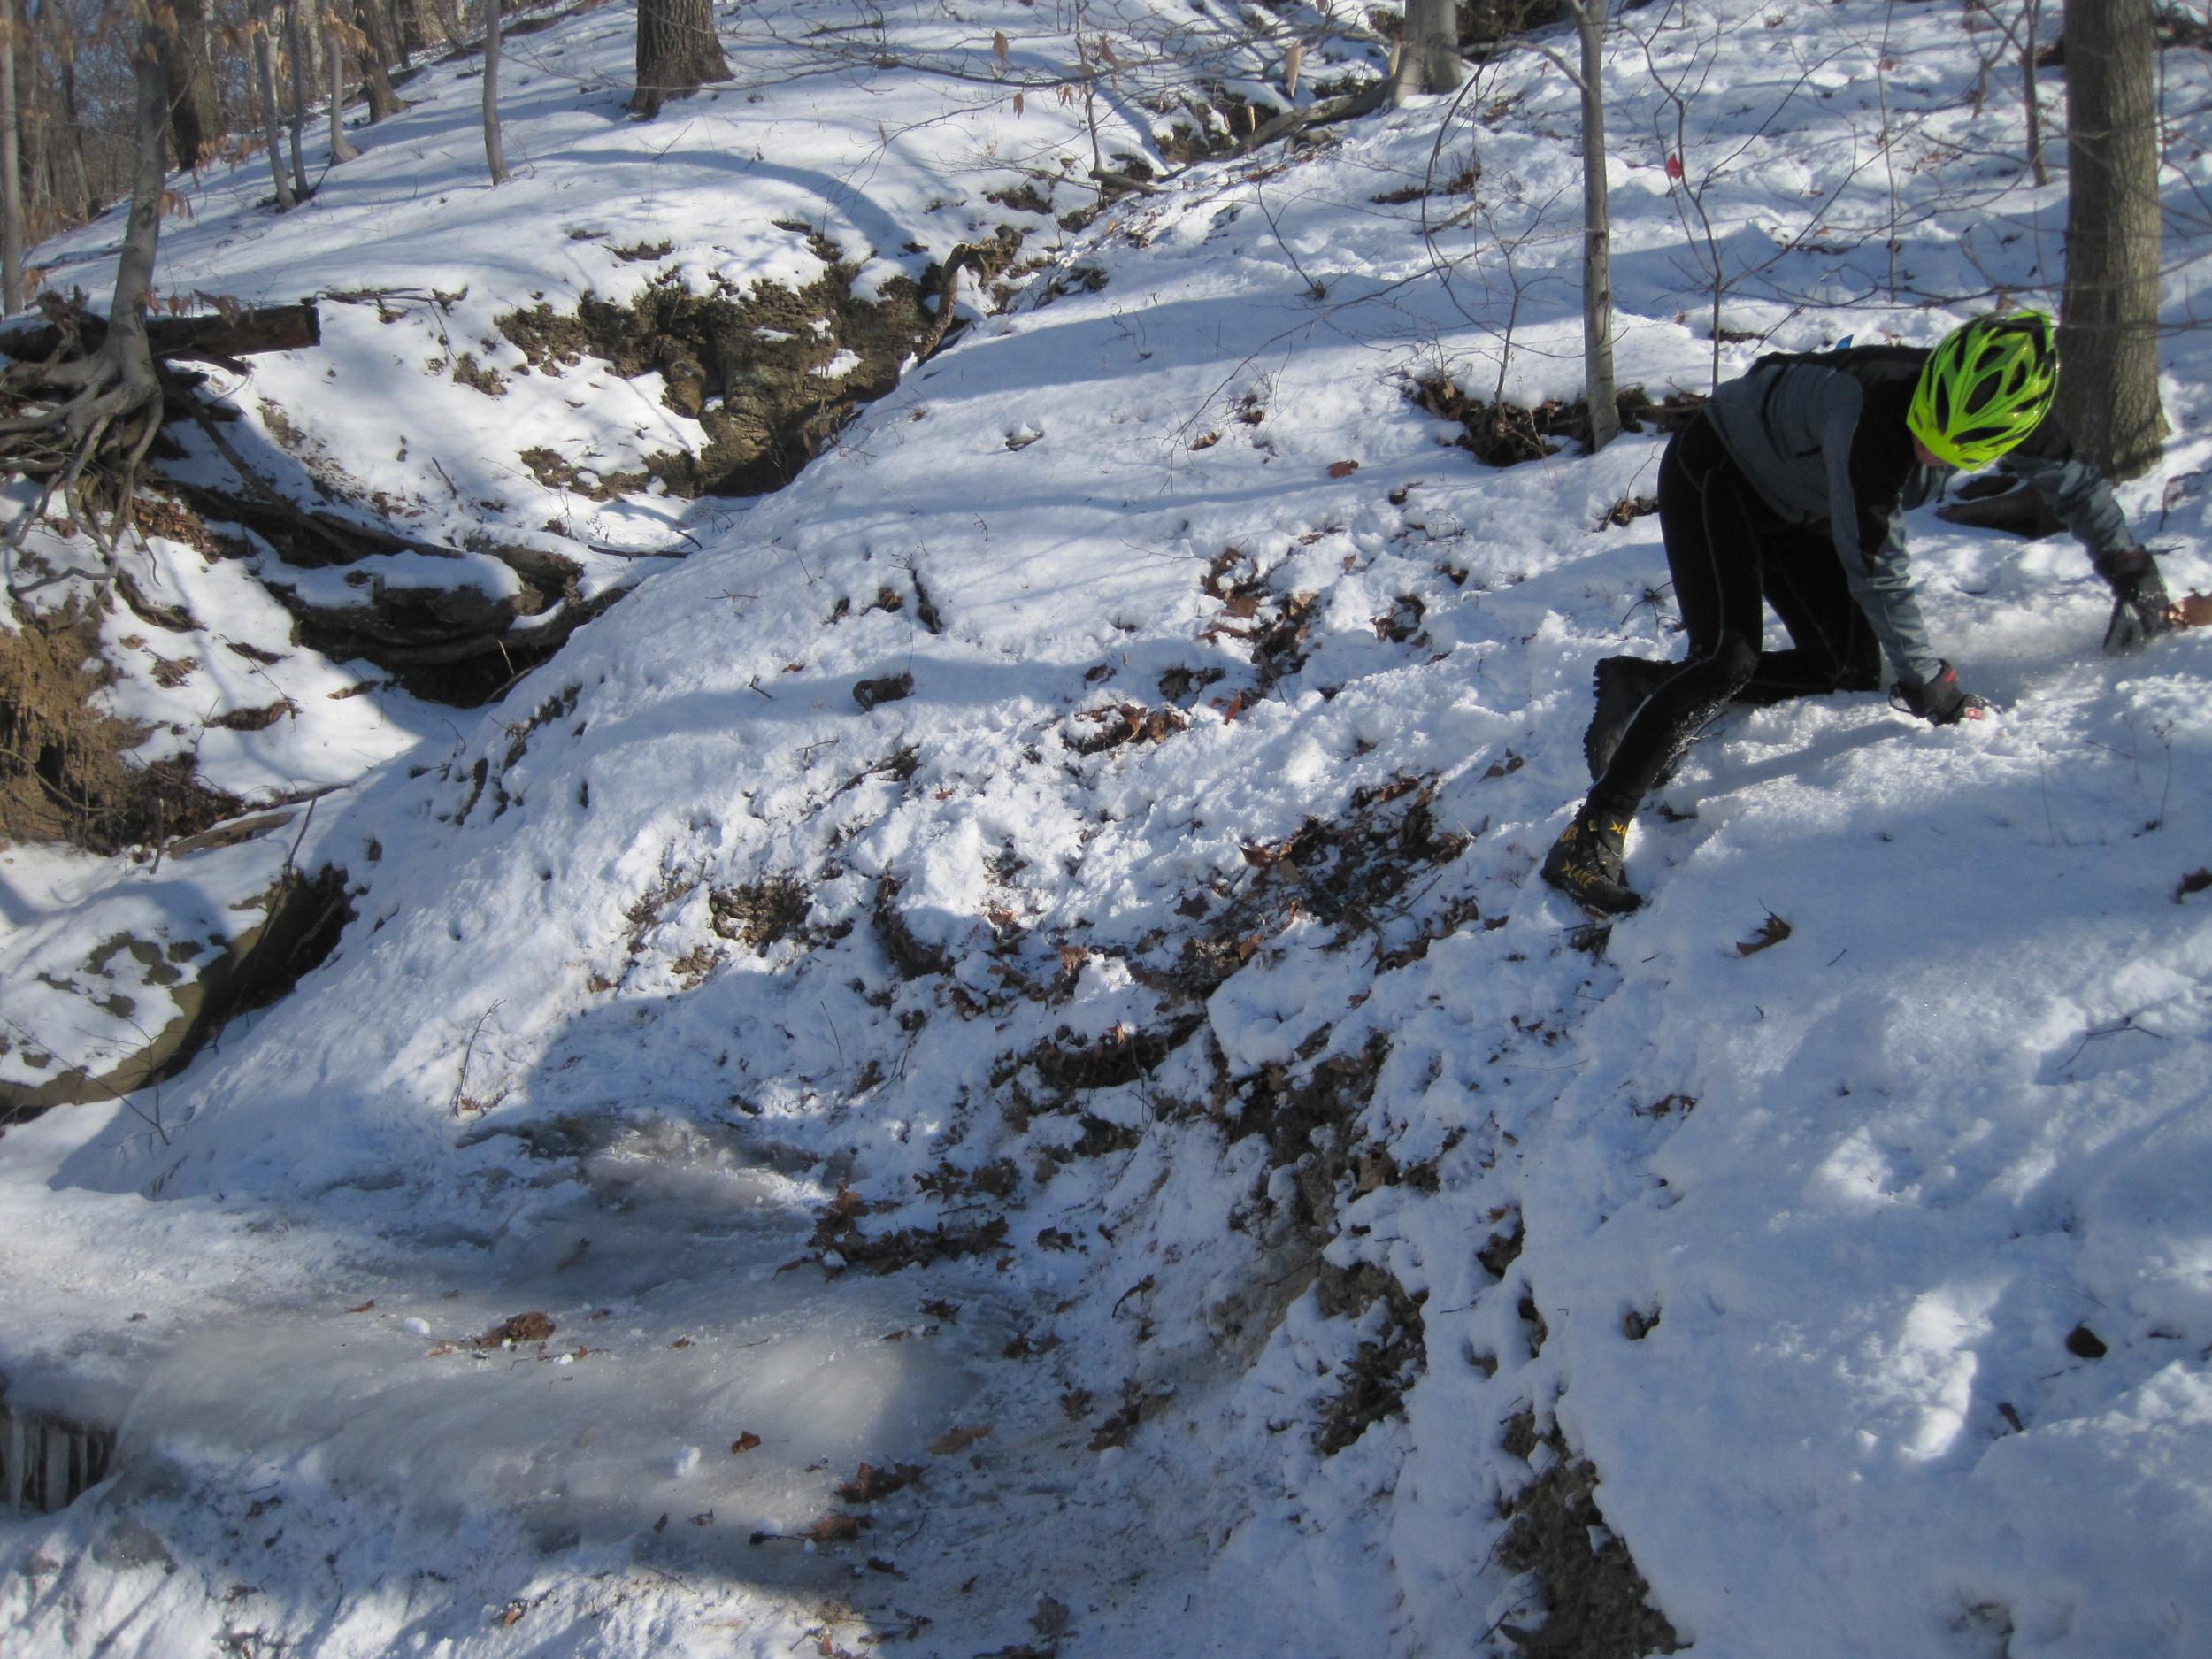 Dinky Bridge is still a little icy. Kristen is taking the high road.